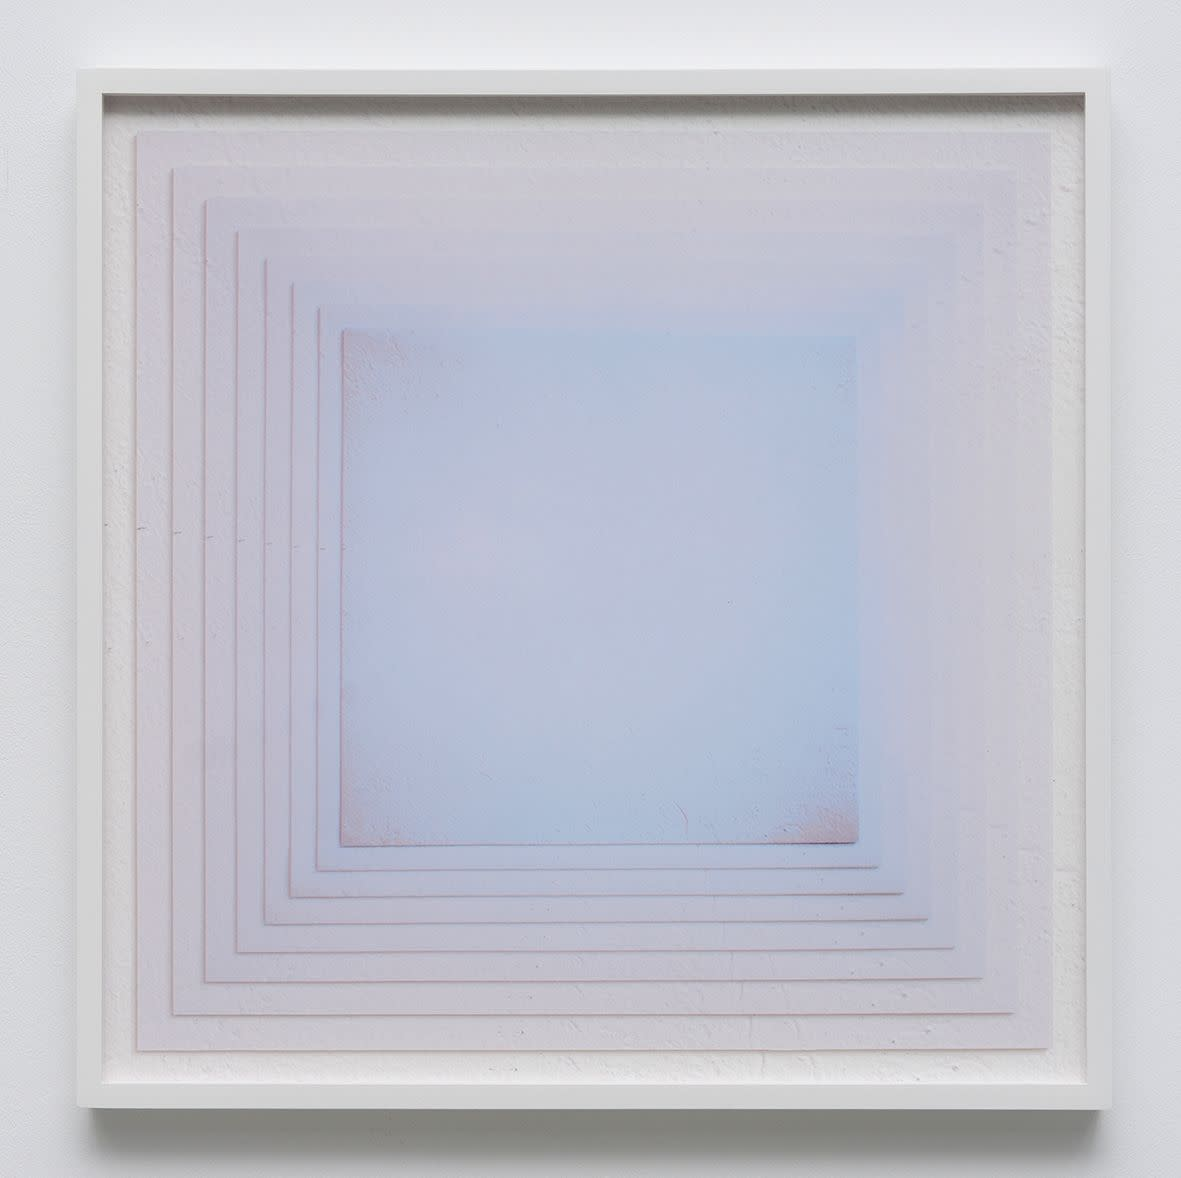 "<span class=""link fancybox-details-link""><a href=""/exhibitions/133/works/artworks9447/"">View Detail Page</a></span><div class=""artist""><strong>Alexander Gutke</strong></div><div class=""title""><em>9 to 5 Stormgatan 4 VII</em>, 2012</div><div class=""medium"">ink jet print</div><div class=""dimensions"">framed: 50 x 50 cm</div>"